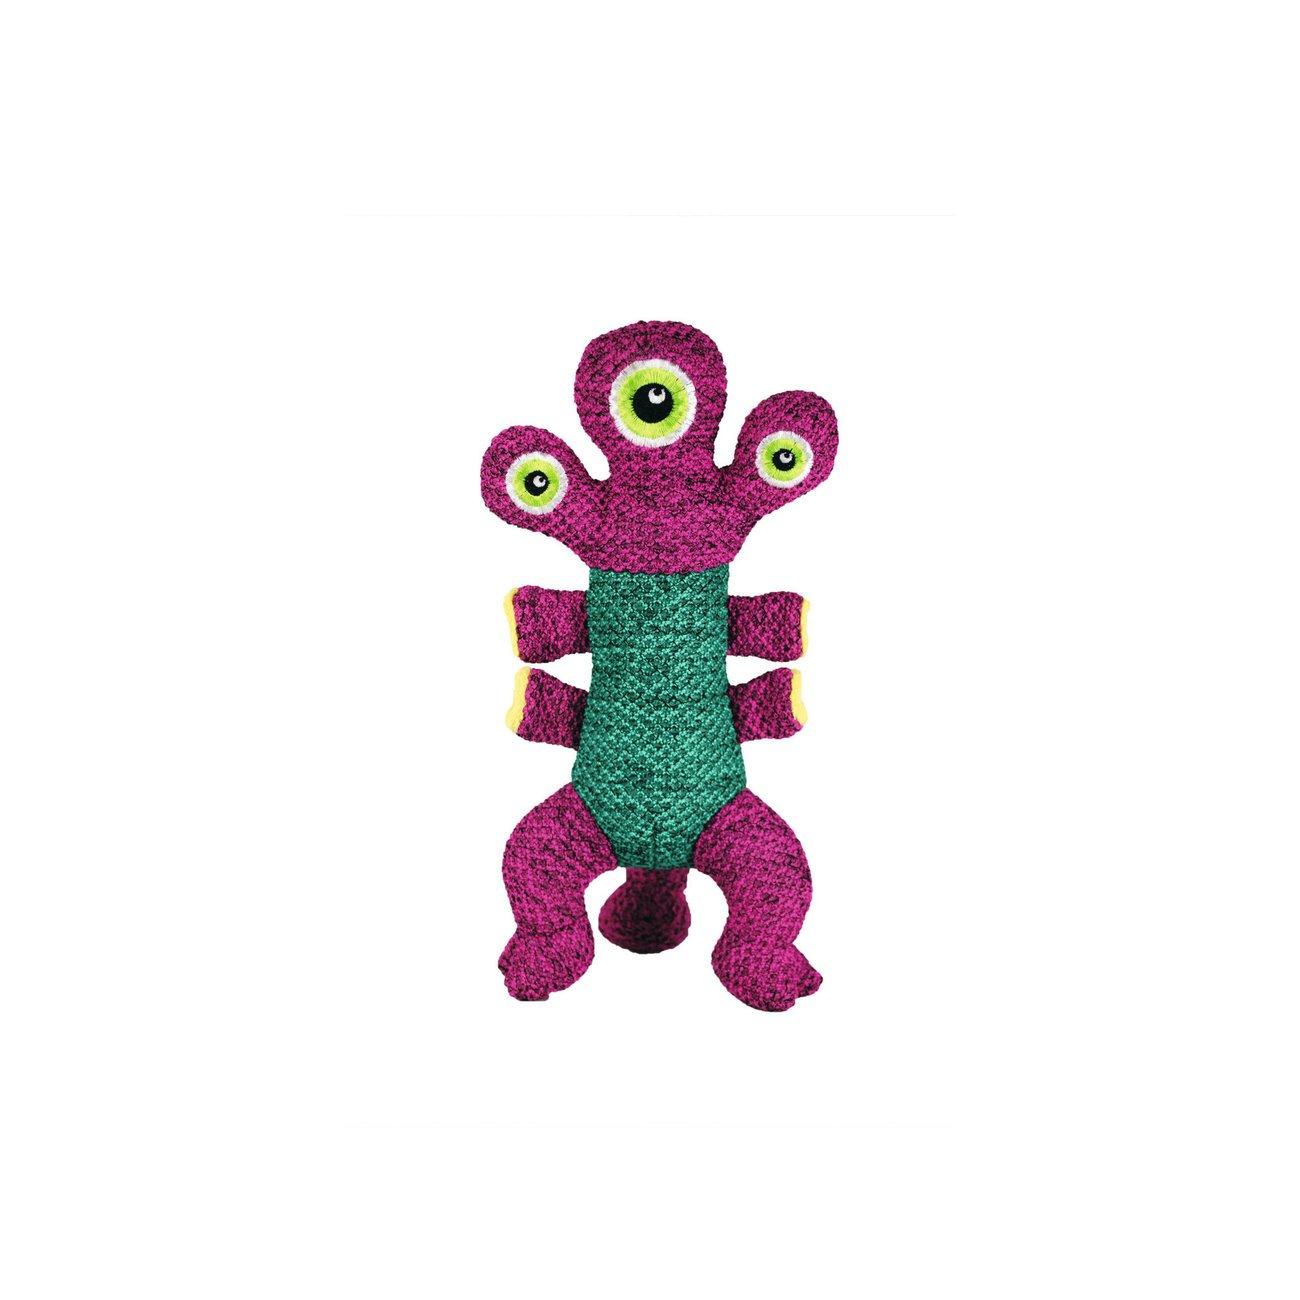 KONG Woozles, pink, 28 cm